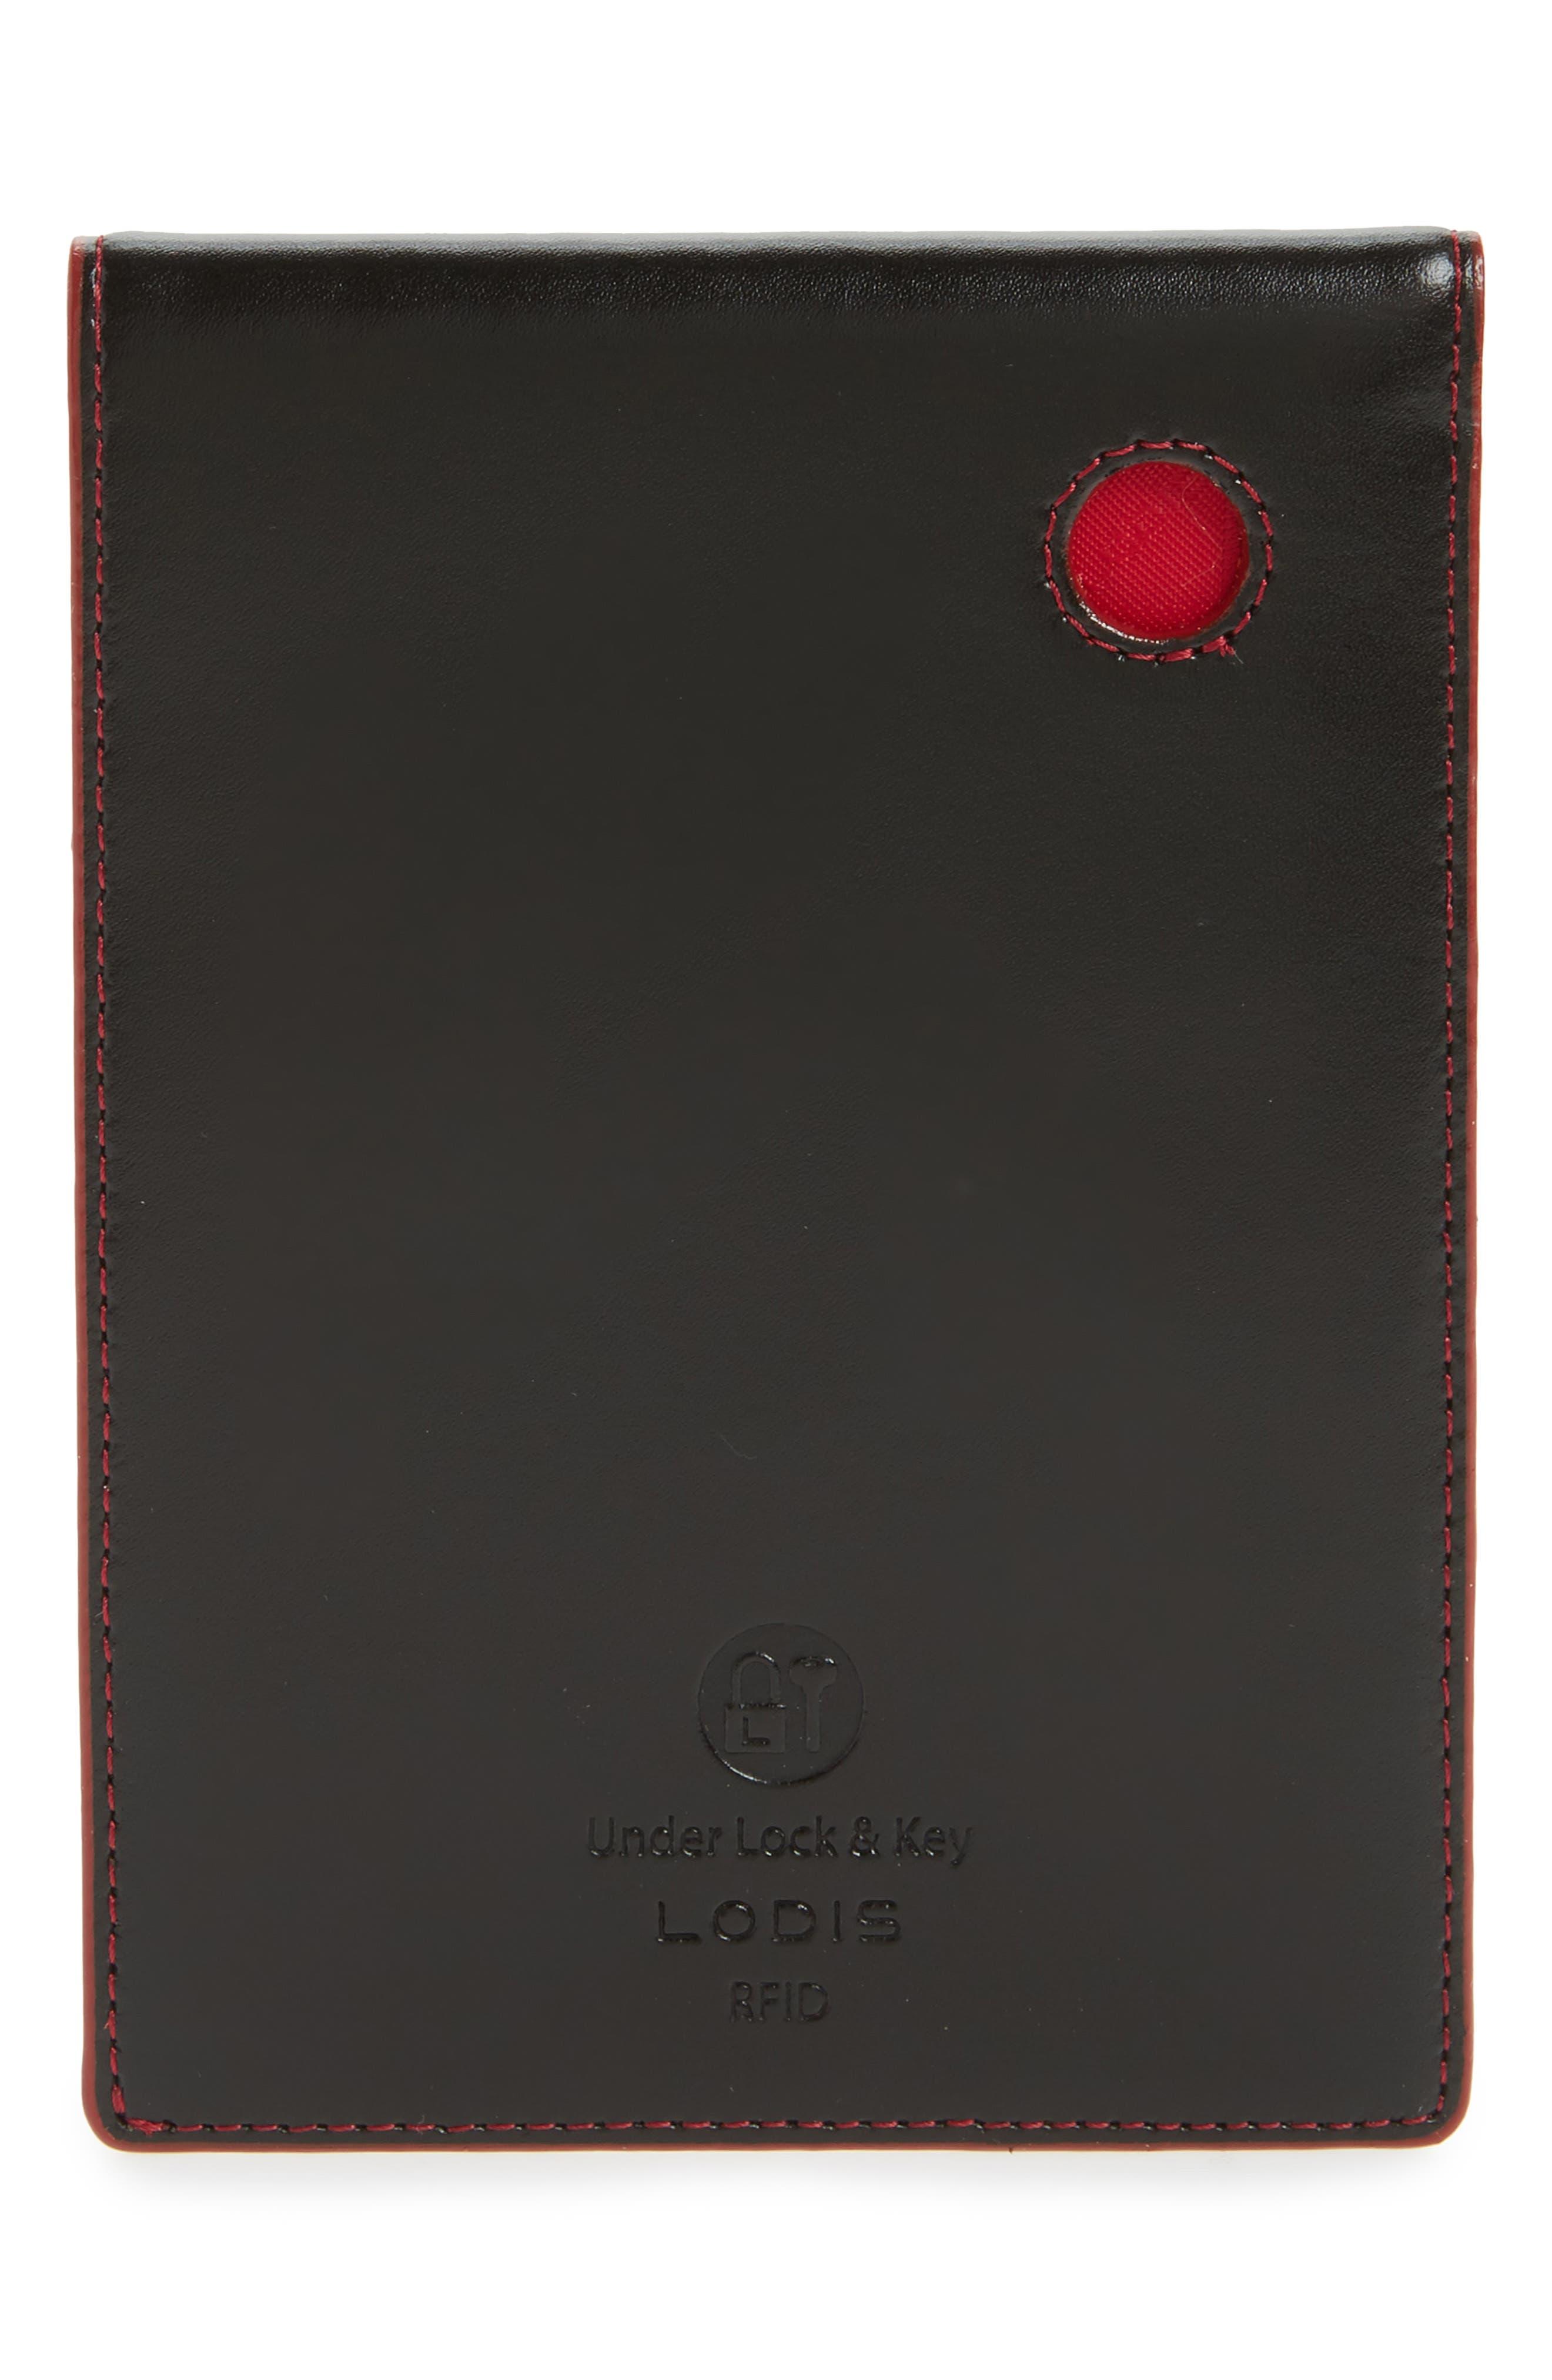 Alternate Image 2  - LODIS Audrey Under Lock & Key Skyler Leather Passport Wallet